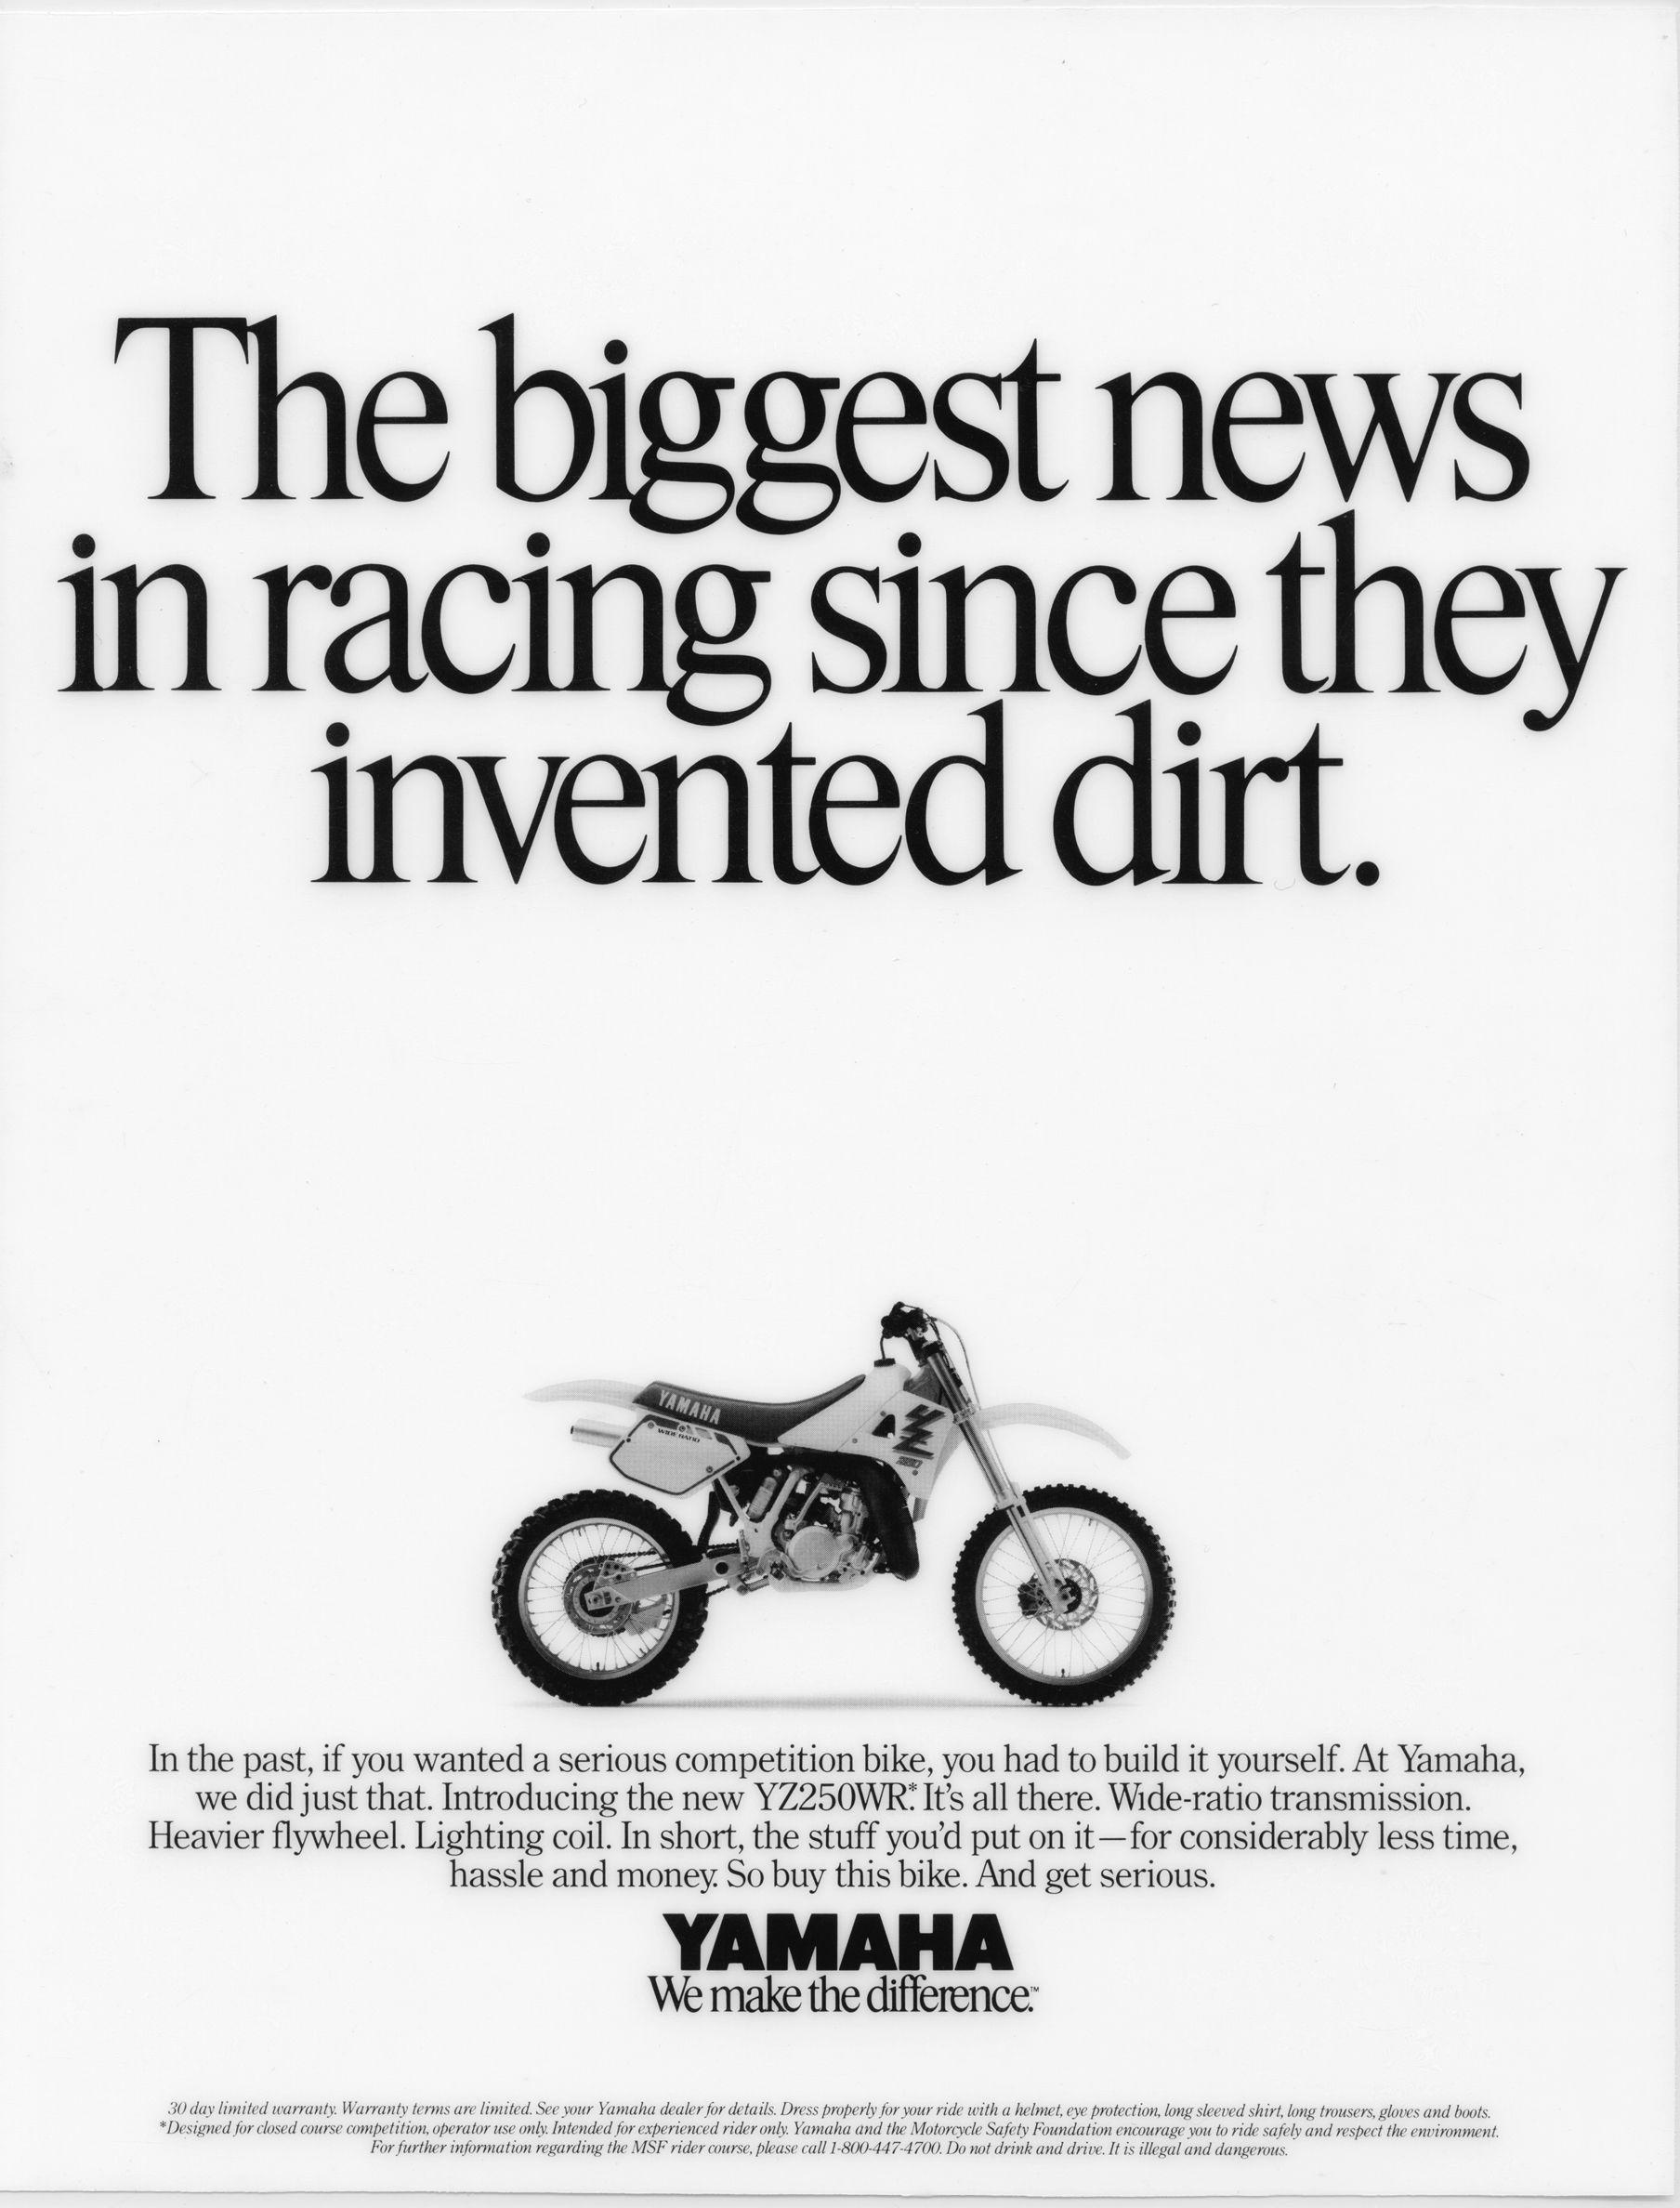 Yamaha Motorcycle Ad